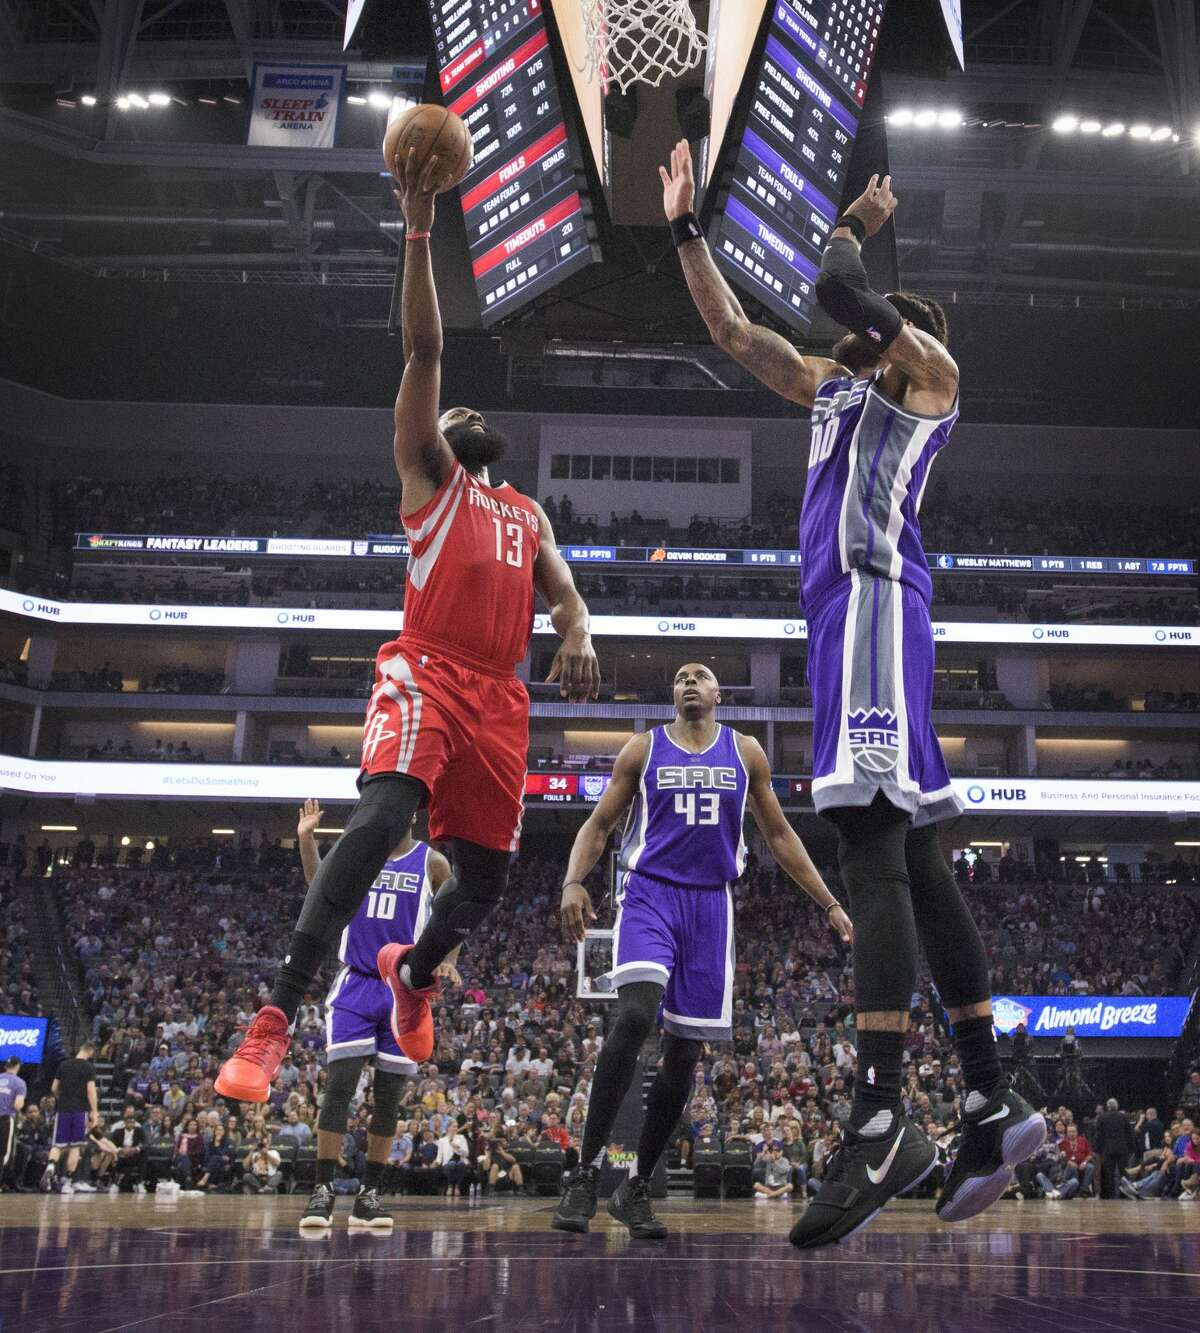 Houston Rockets guard James Harden (13) makes a basket against the Sacramento Kings center Willie Cauley-Stein (00) on Sunday, April 9, 2017 at Golden 1 Center in Sacramento, Calif. (Hector Amezcua/Sacramento Bee/TNS)